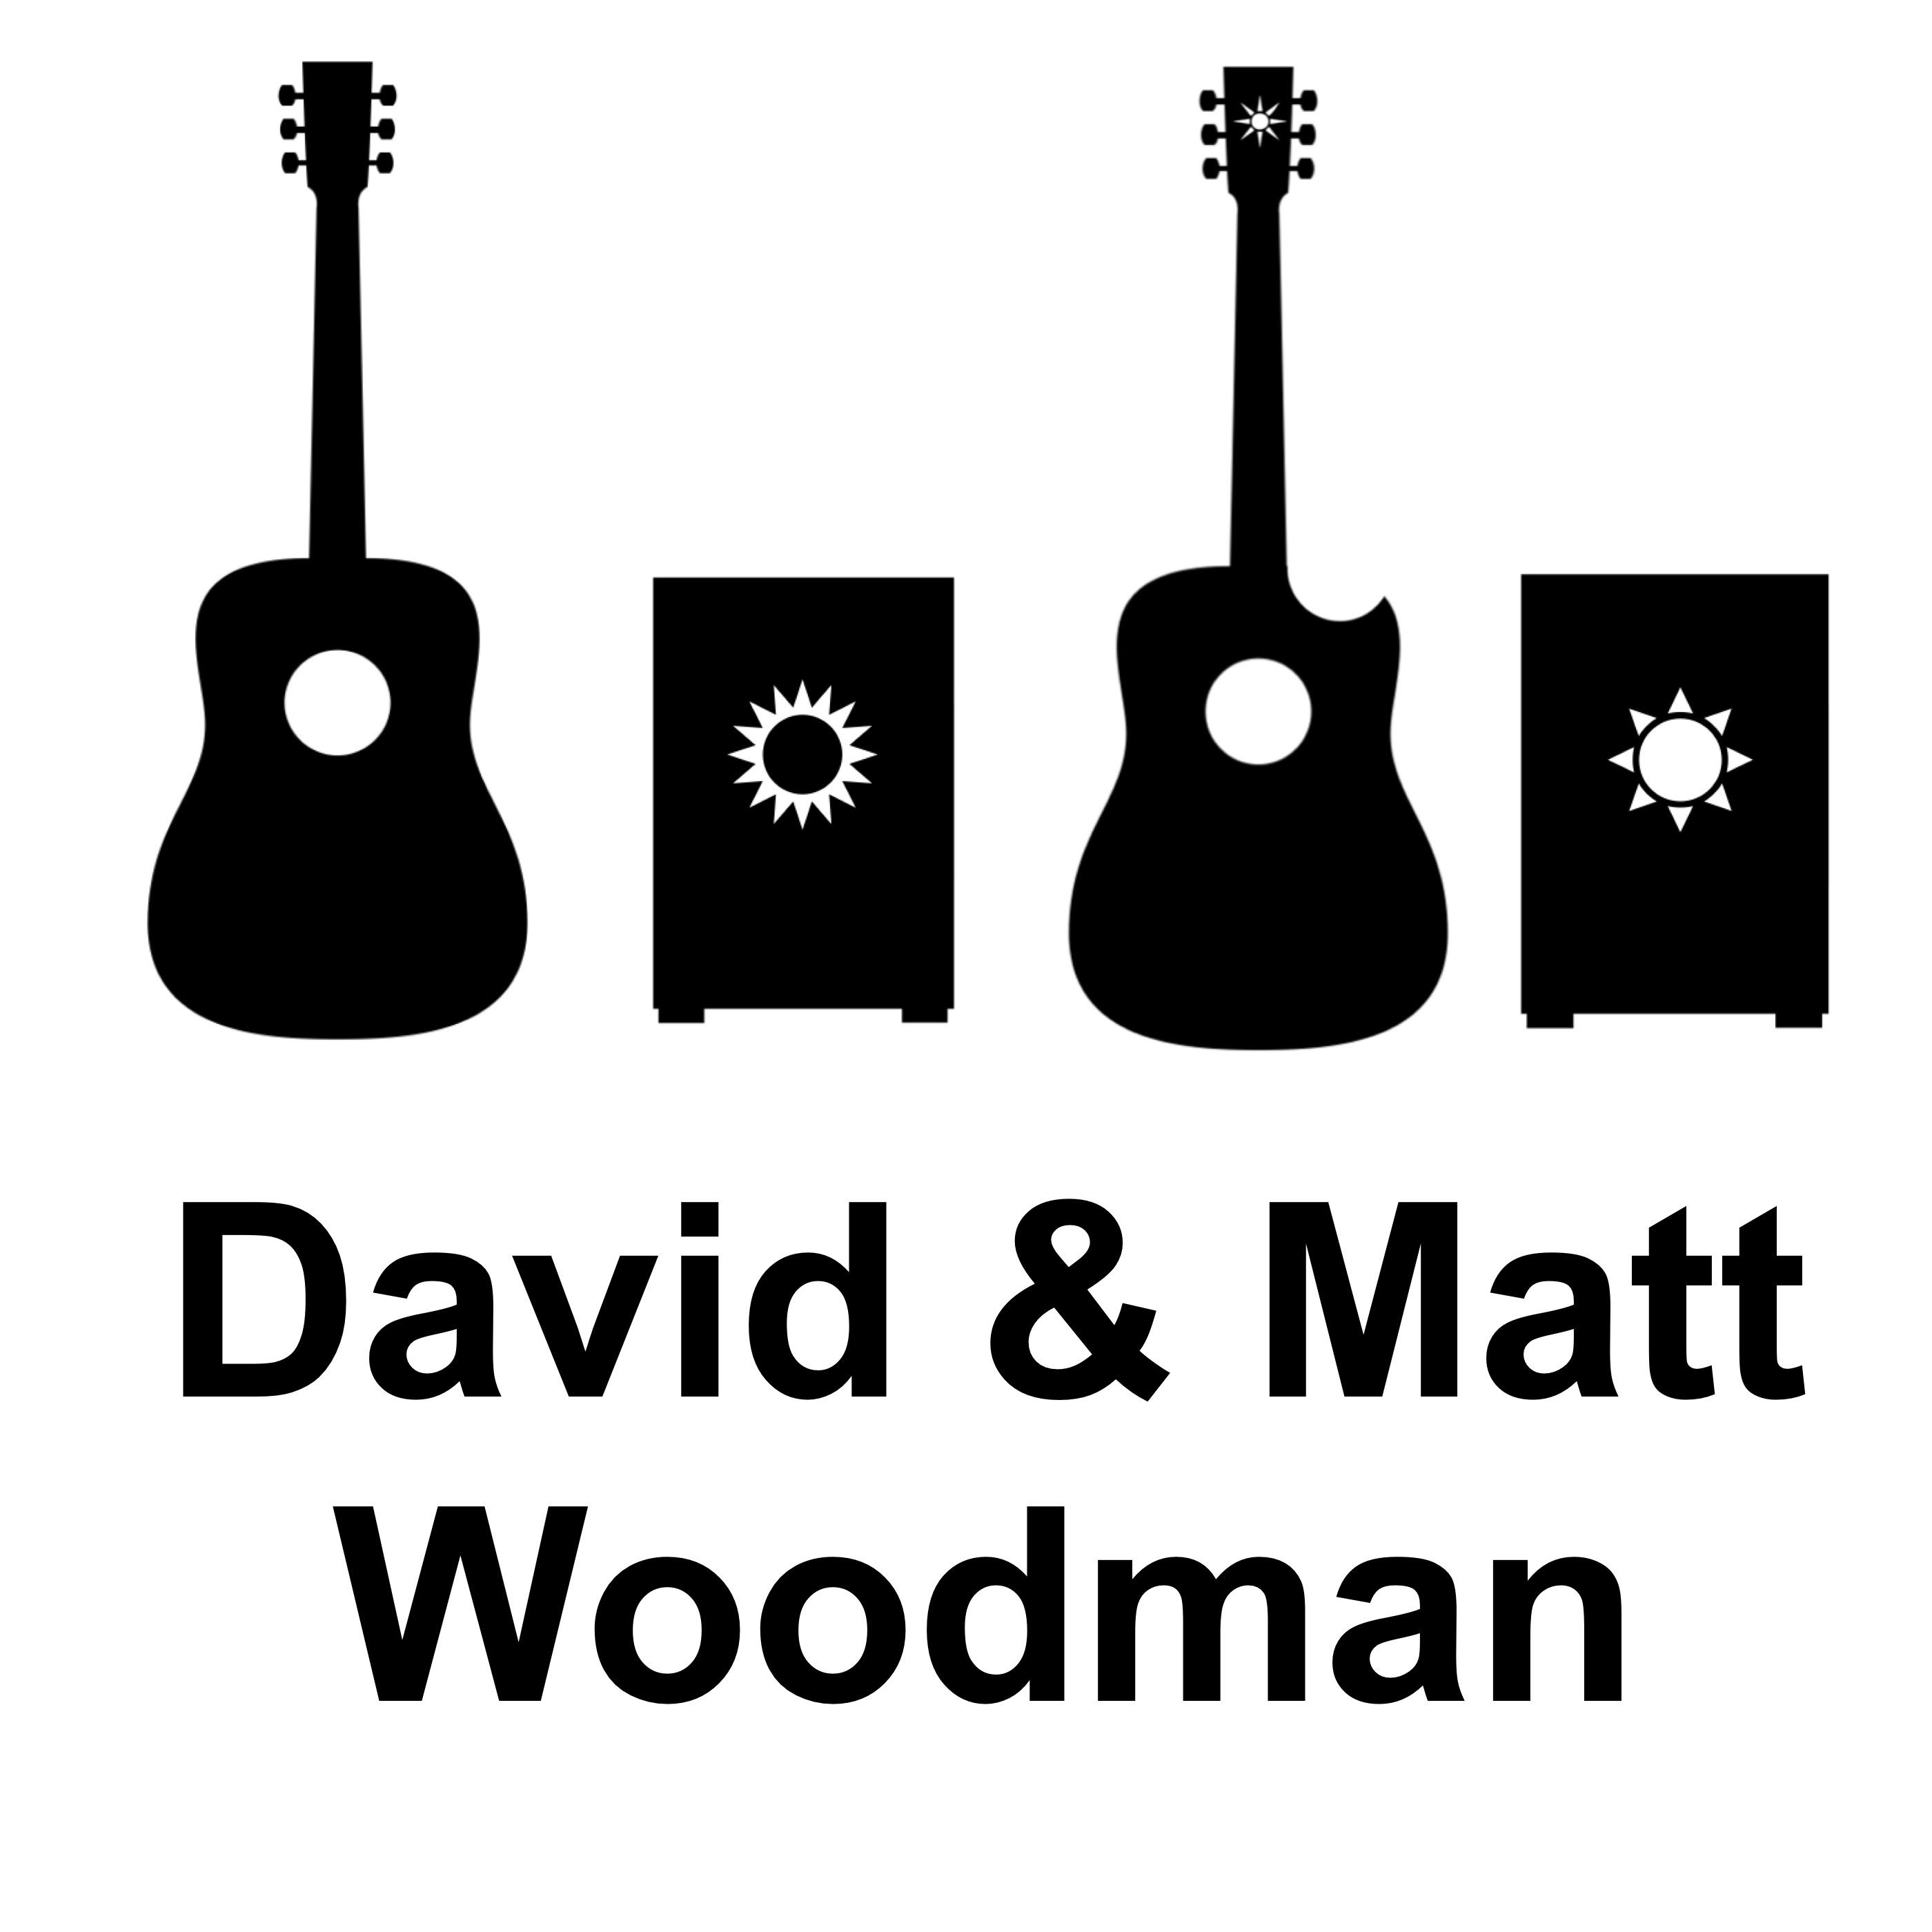 David and Matt Woodman